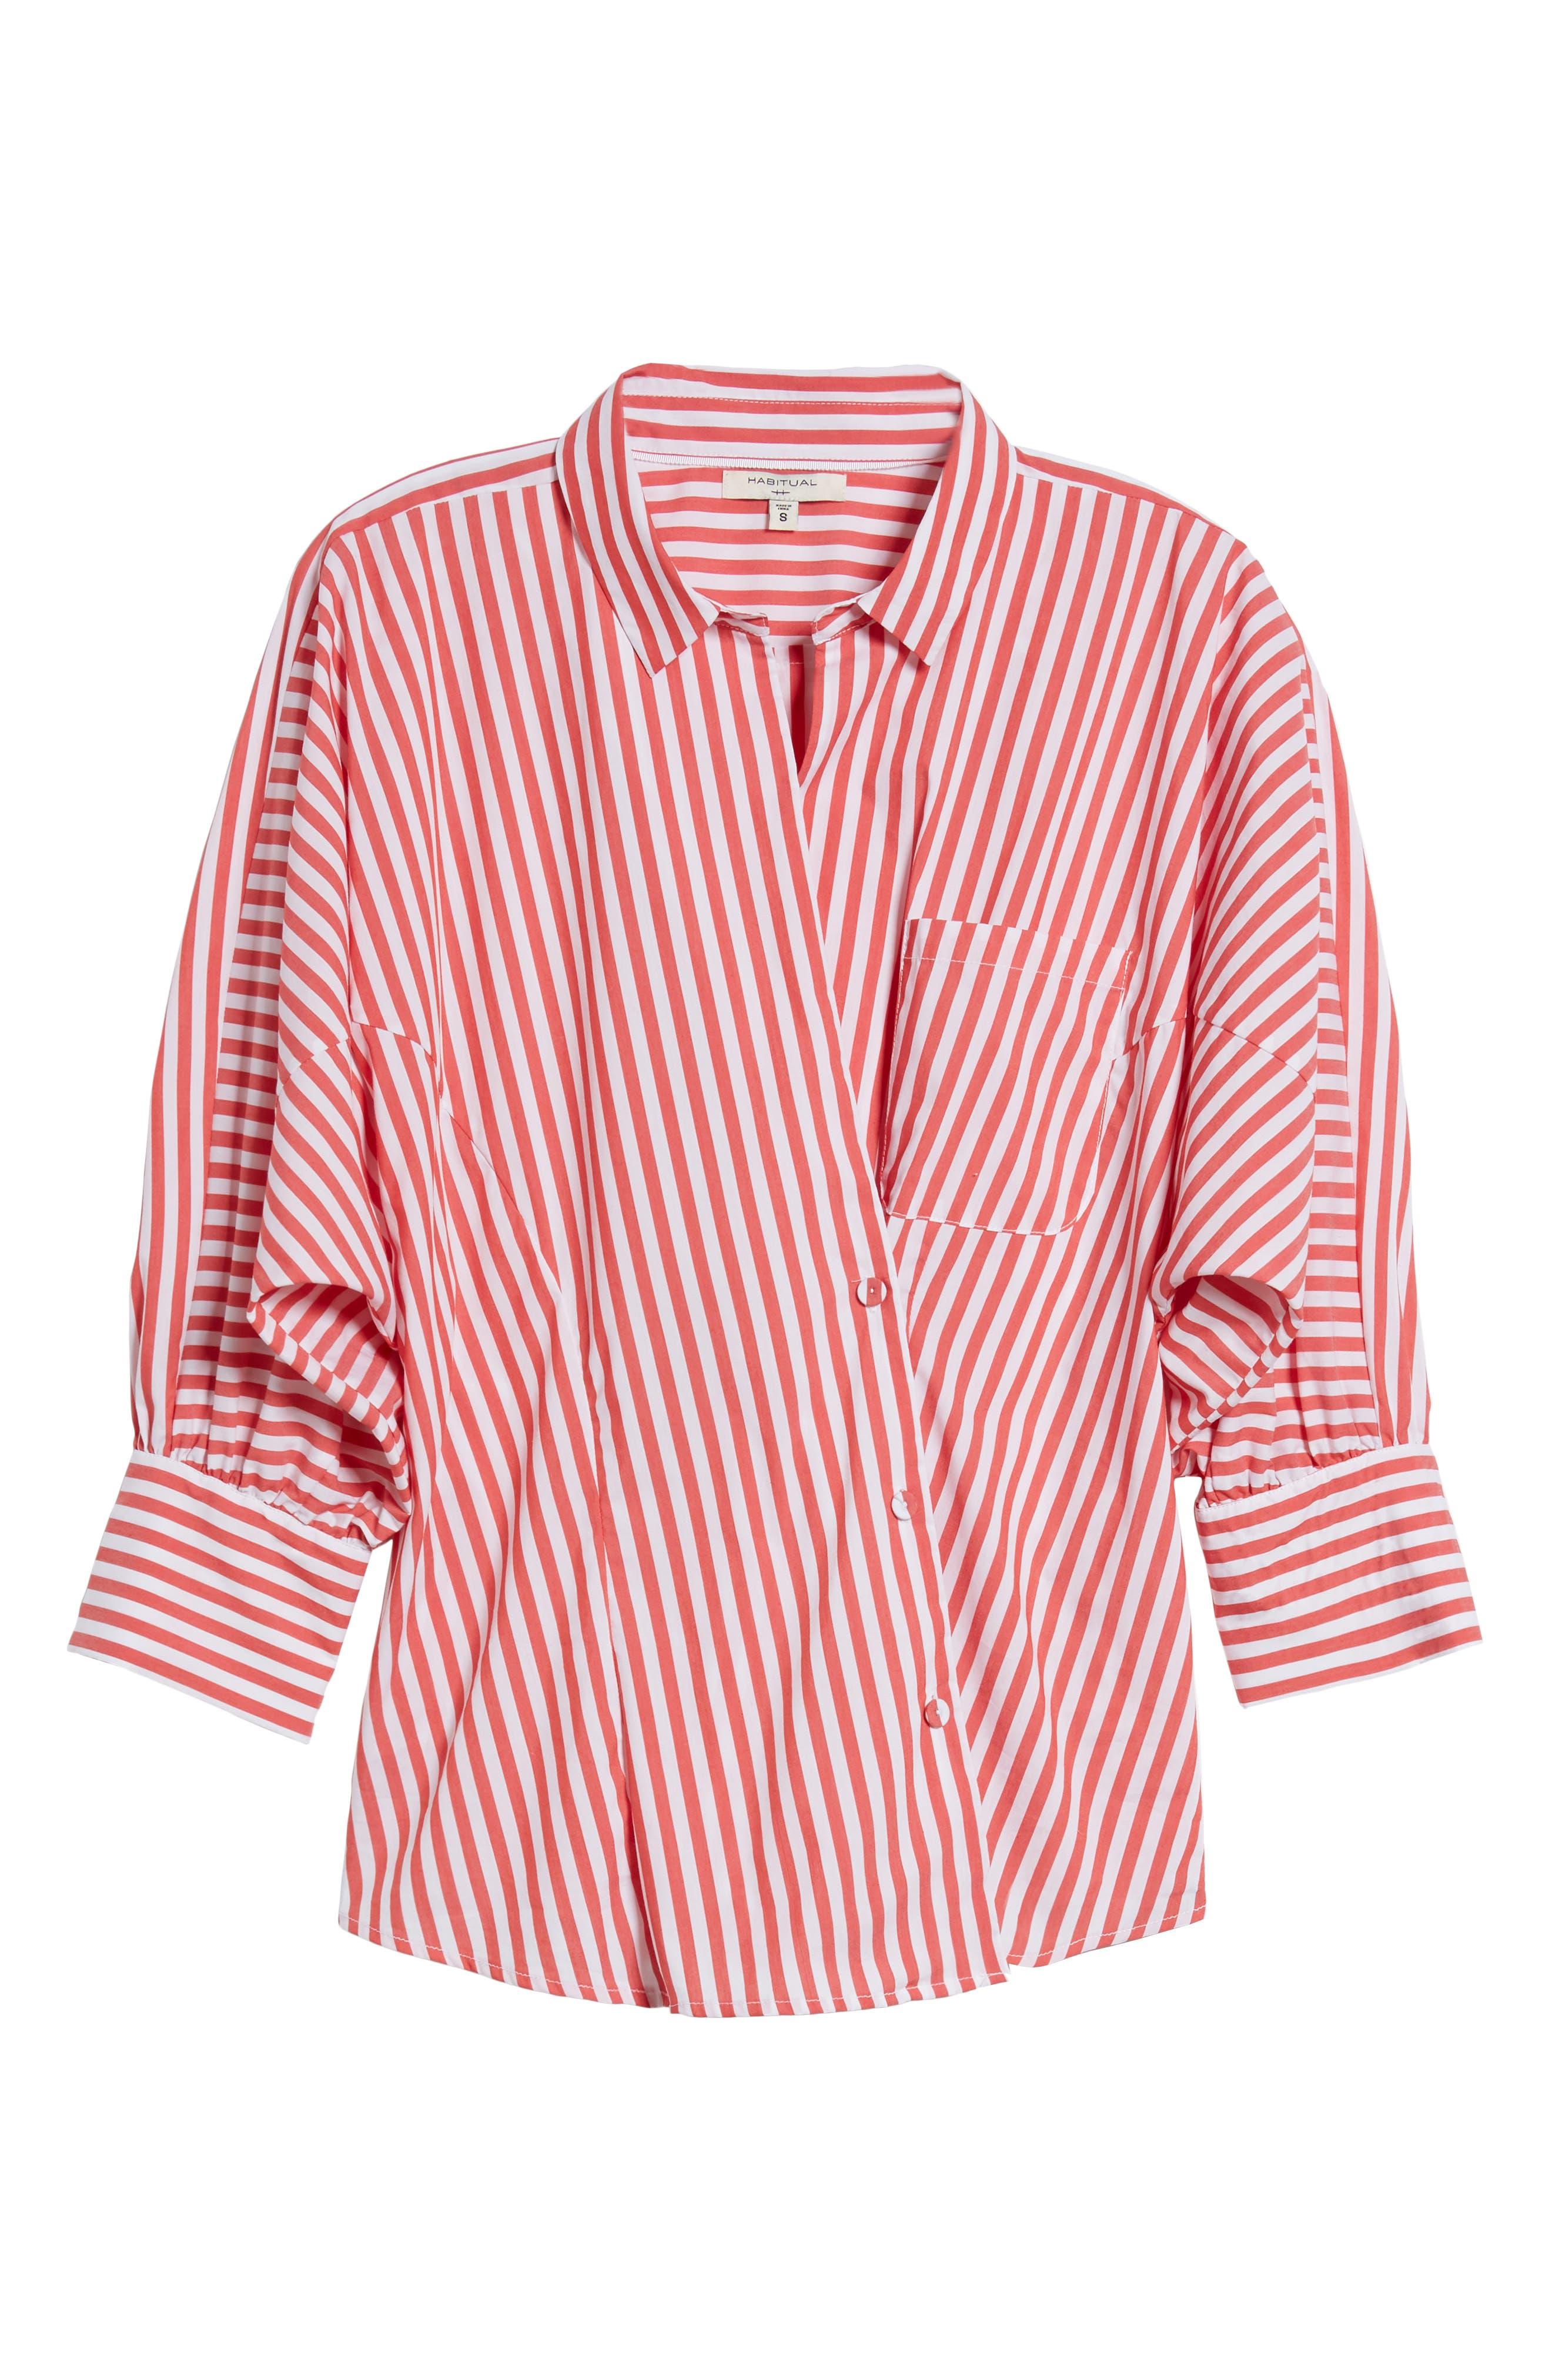 Asymmetrical Stripe Blouse,                             Alternate thumbnail 7, color,                             RED/ WHITE STRIPE